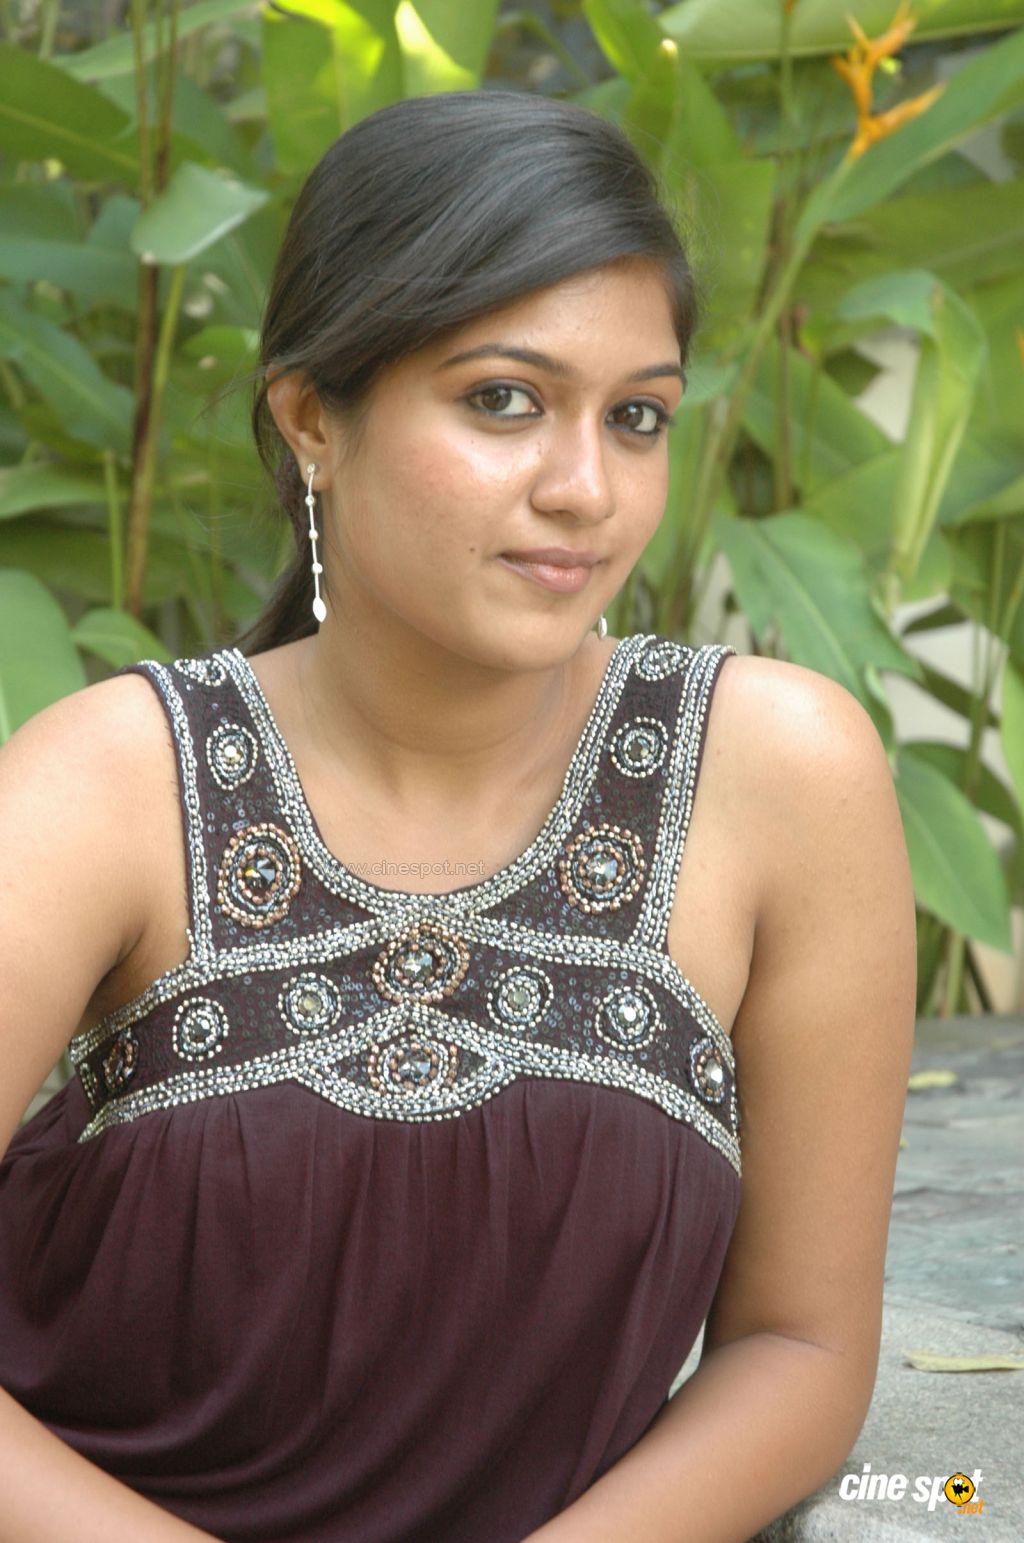 Jakkamma Movie Meghana Raj Latest Hot Stills - HD Latest